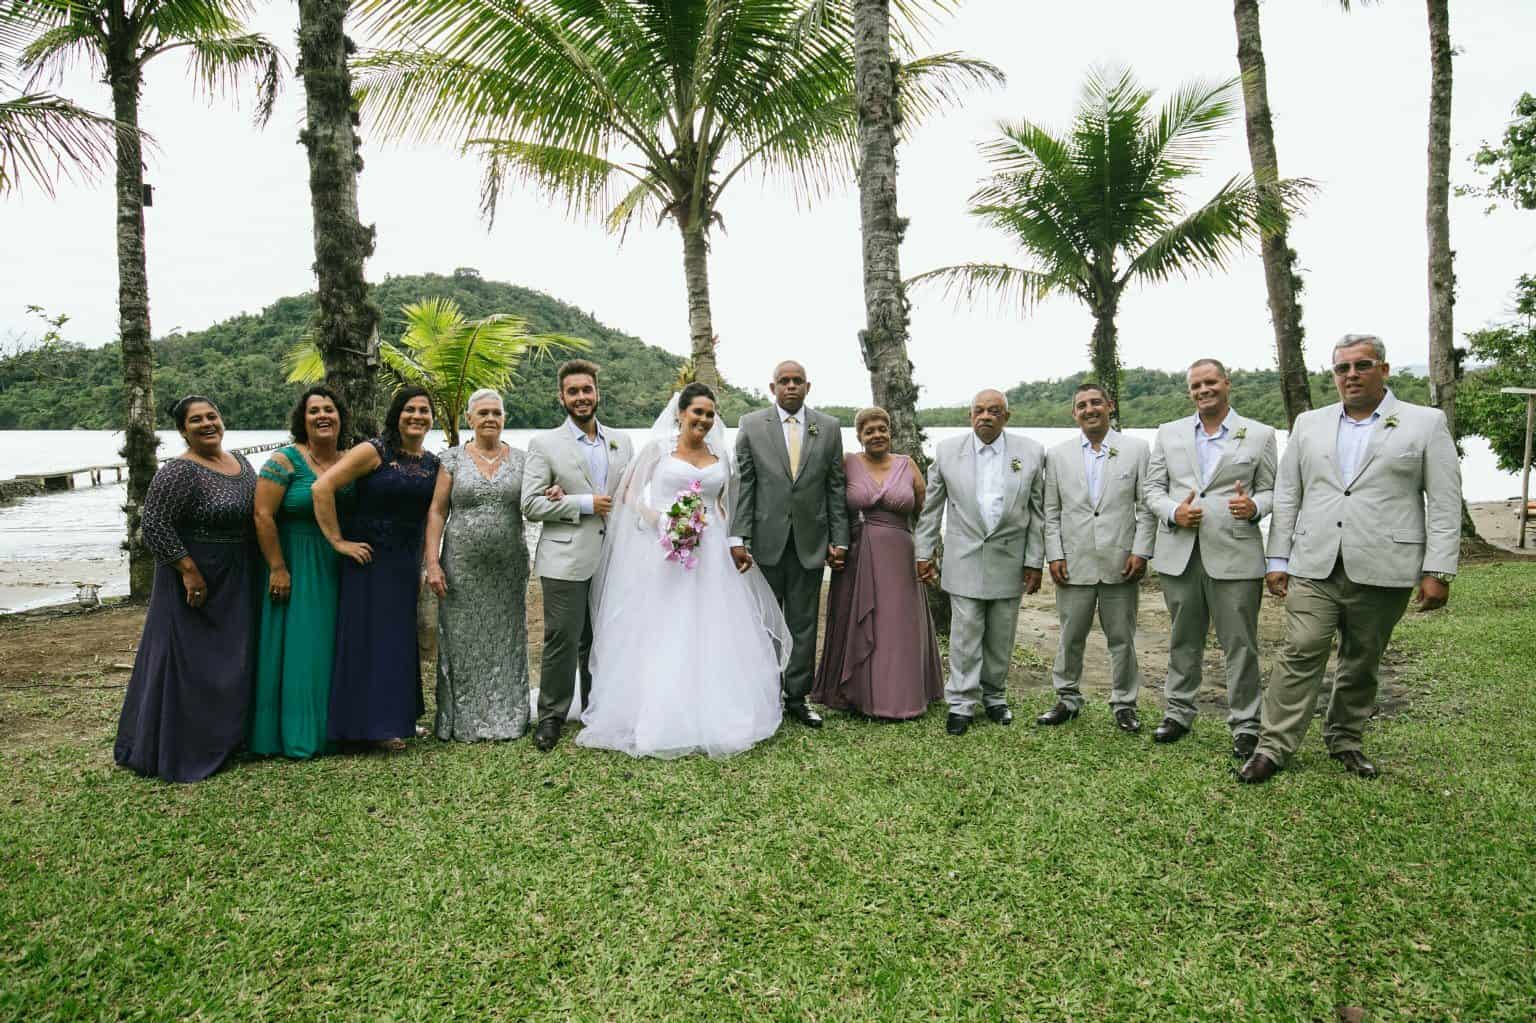 casamento-karina-e-marcos-felizes-para-sempre-caseme-39